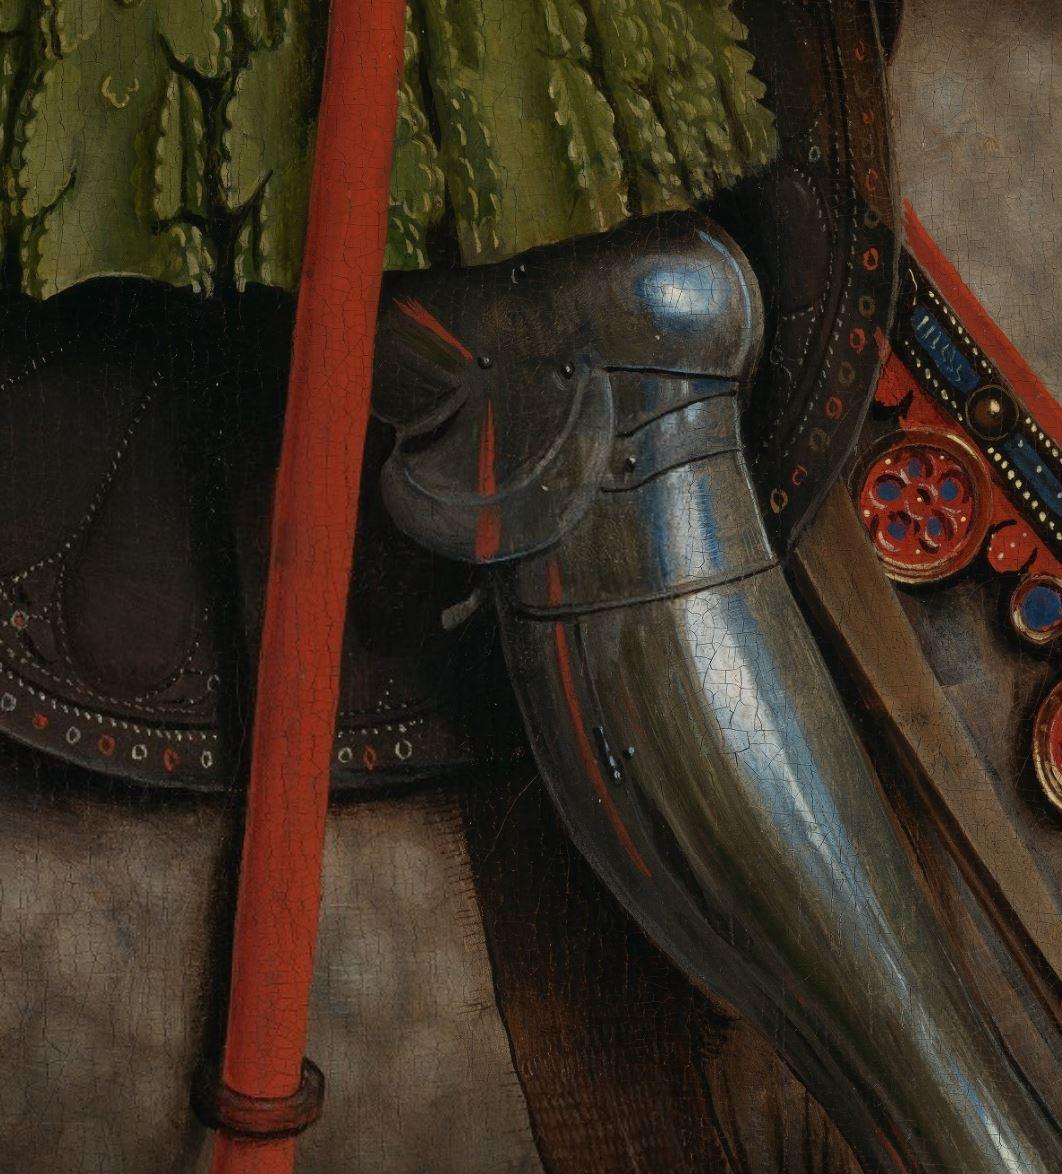 Van Eyck 1432 Les chevaliers du Christ retable de Gand detail genouillere